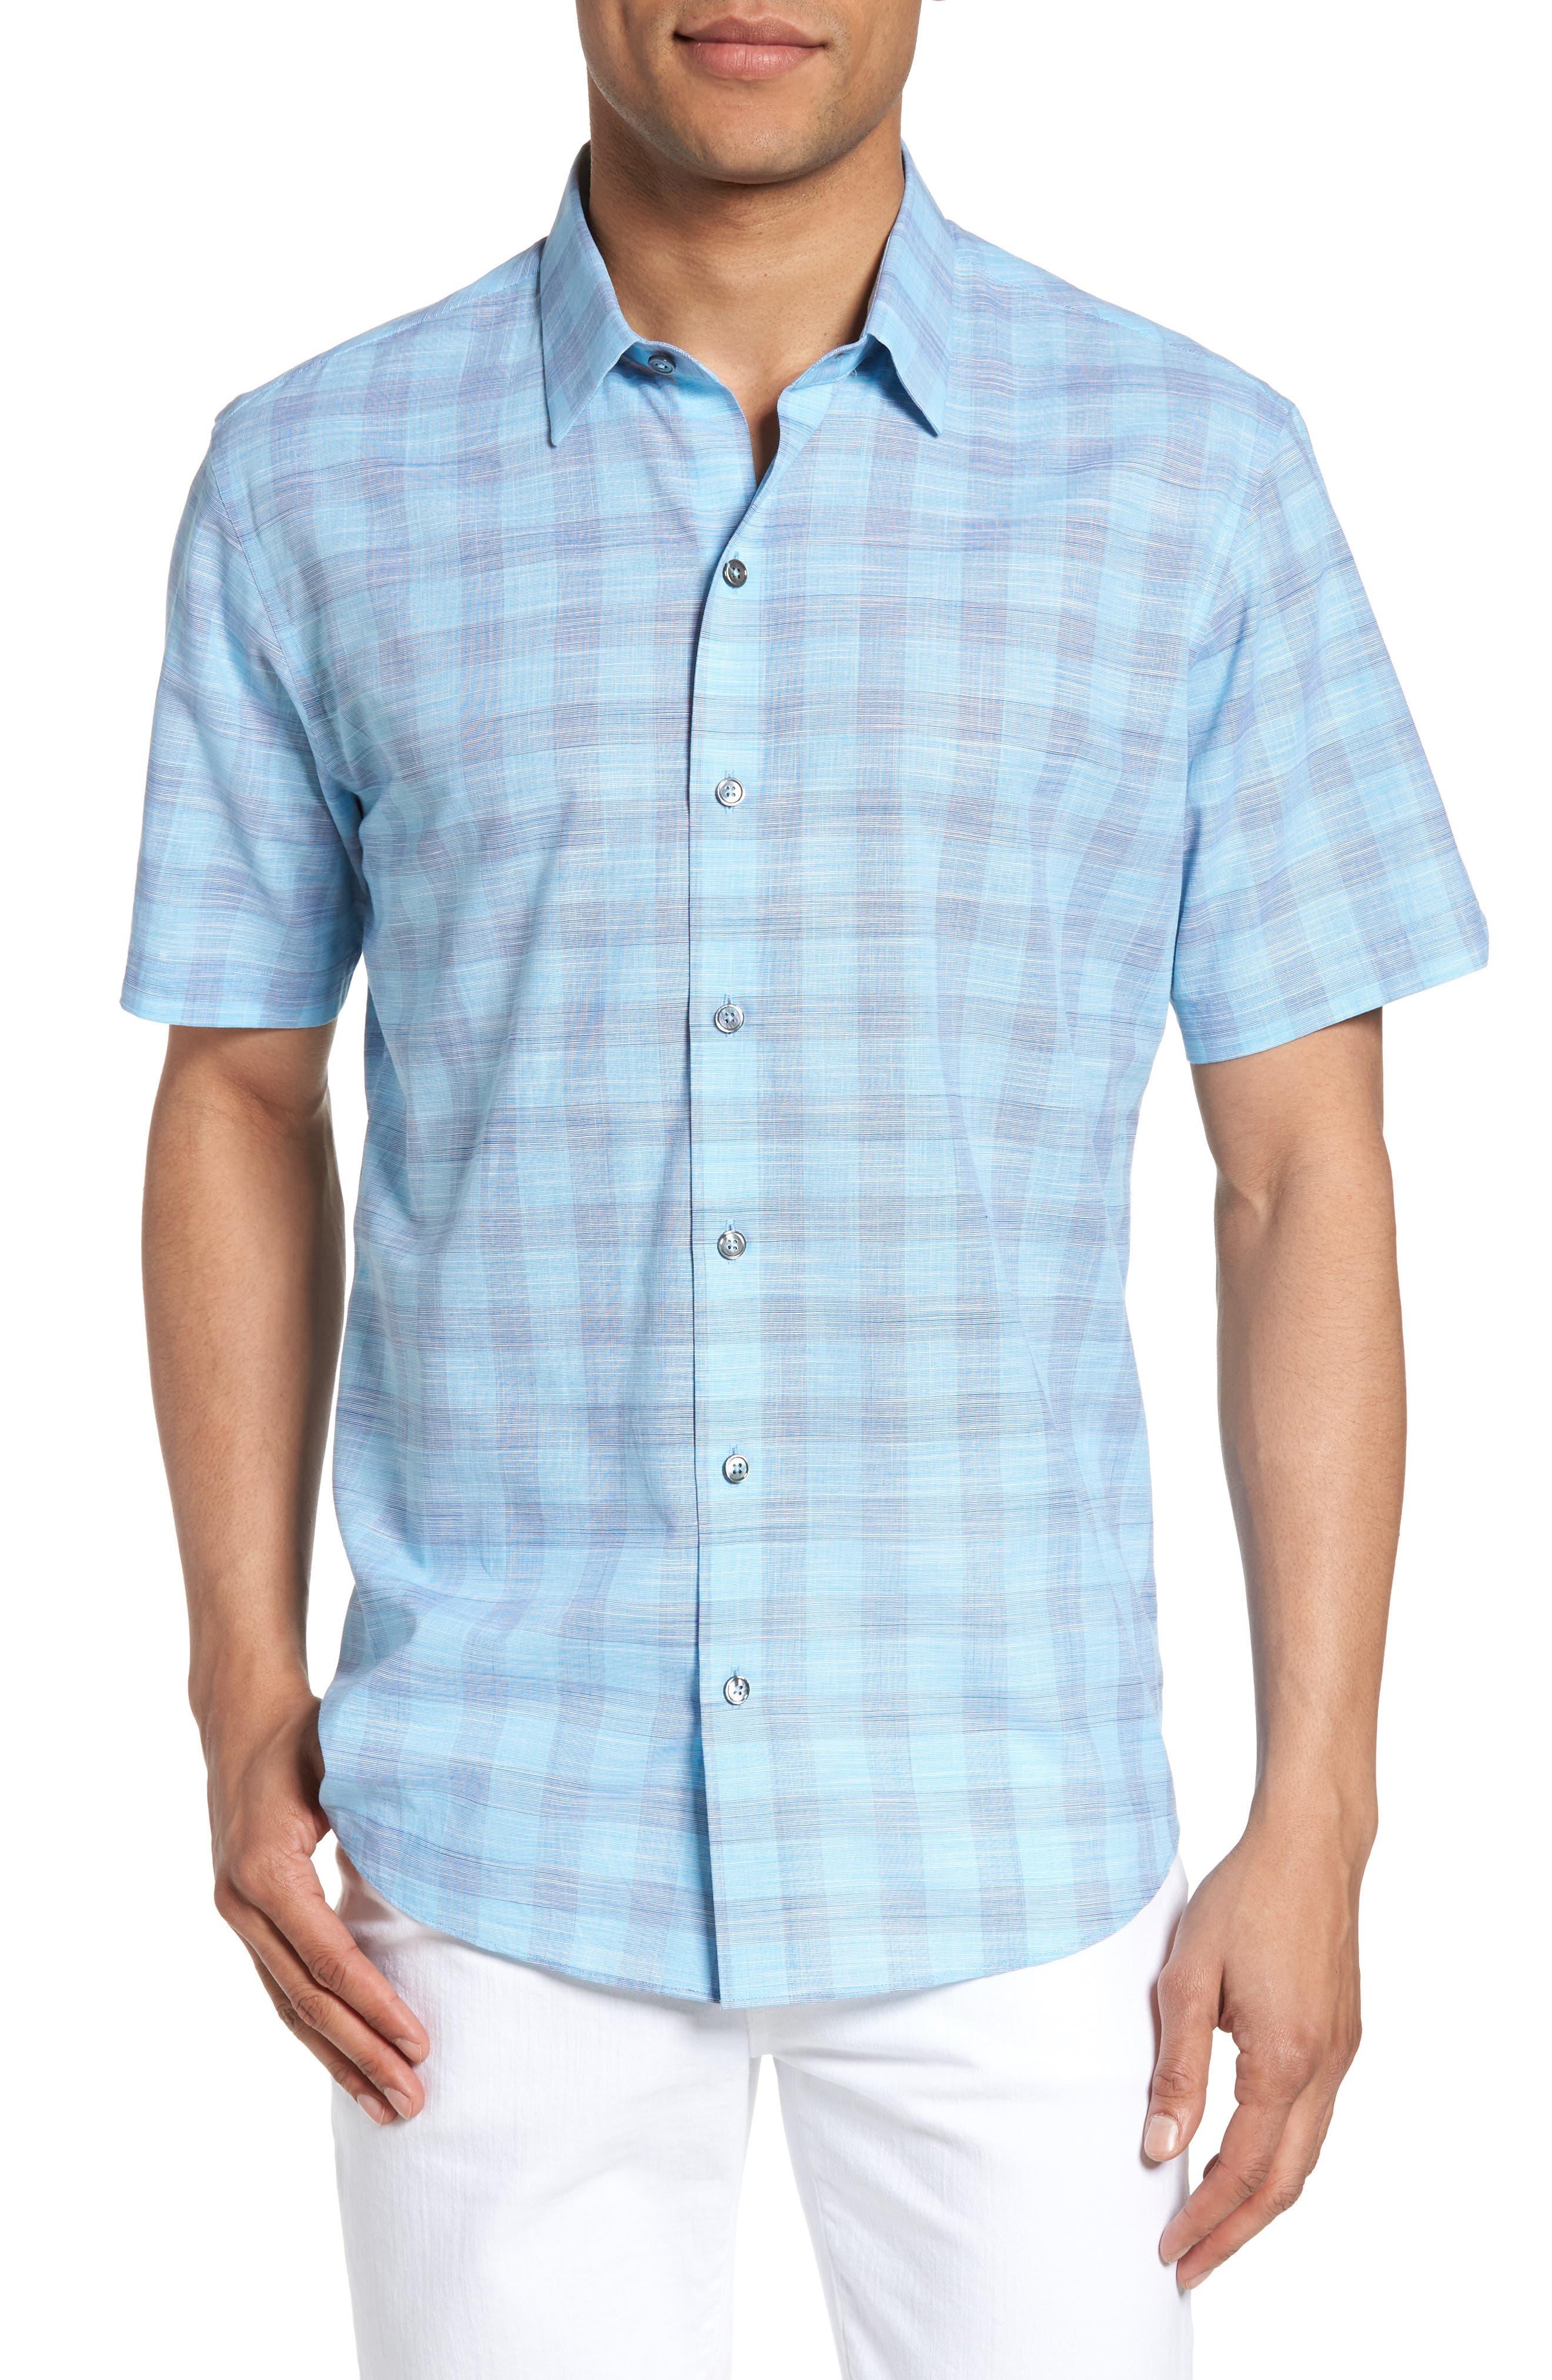 Hasanagic Trim Fit Plaid Sport Shirt,                         Main,                         color, Turquoise